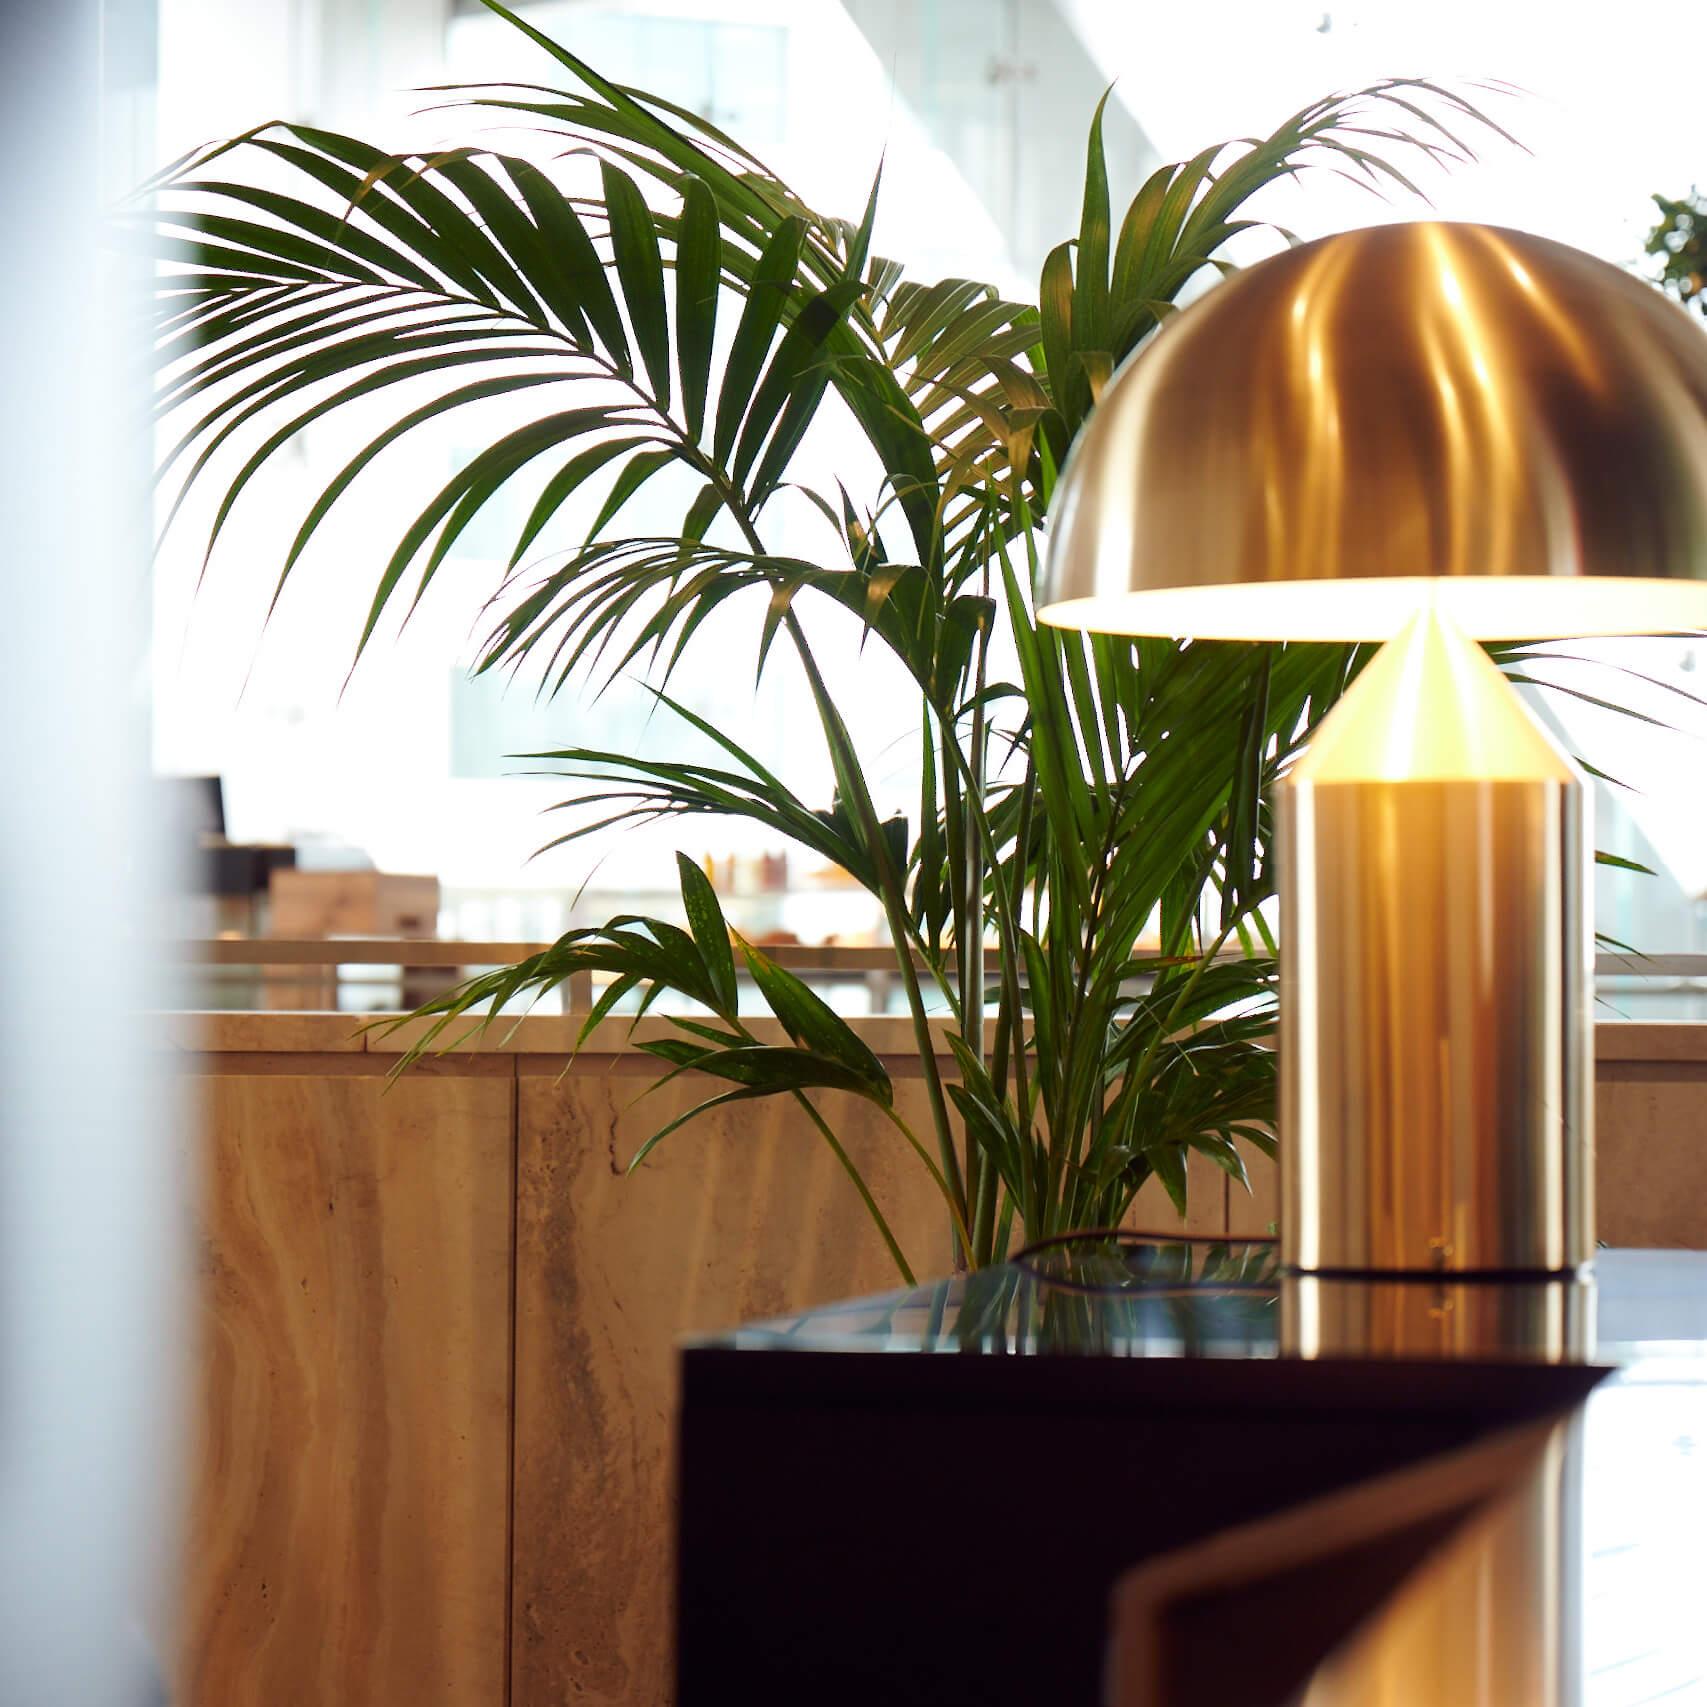 portfolio-offices-spaces-commercialbay-image2